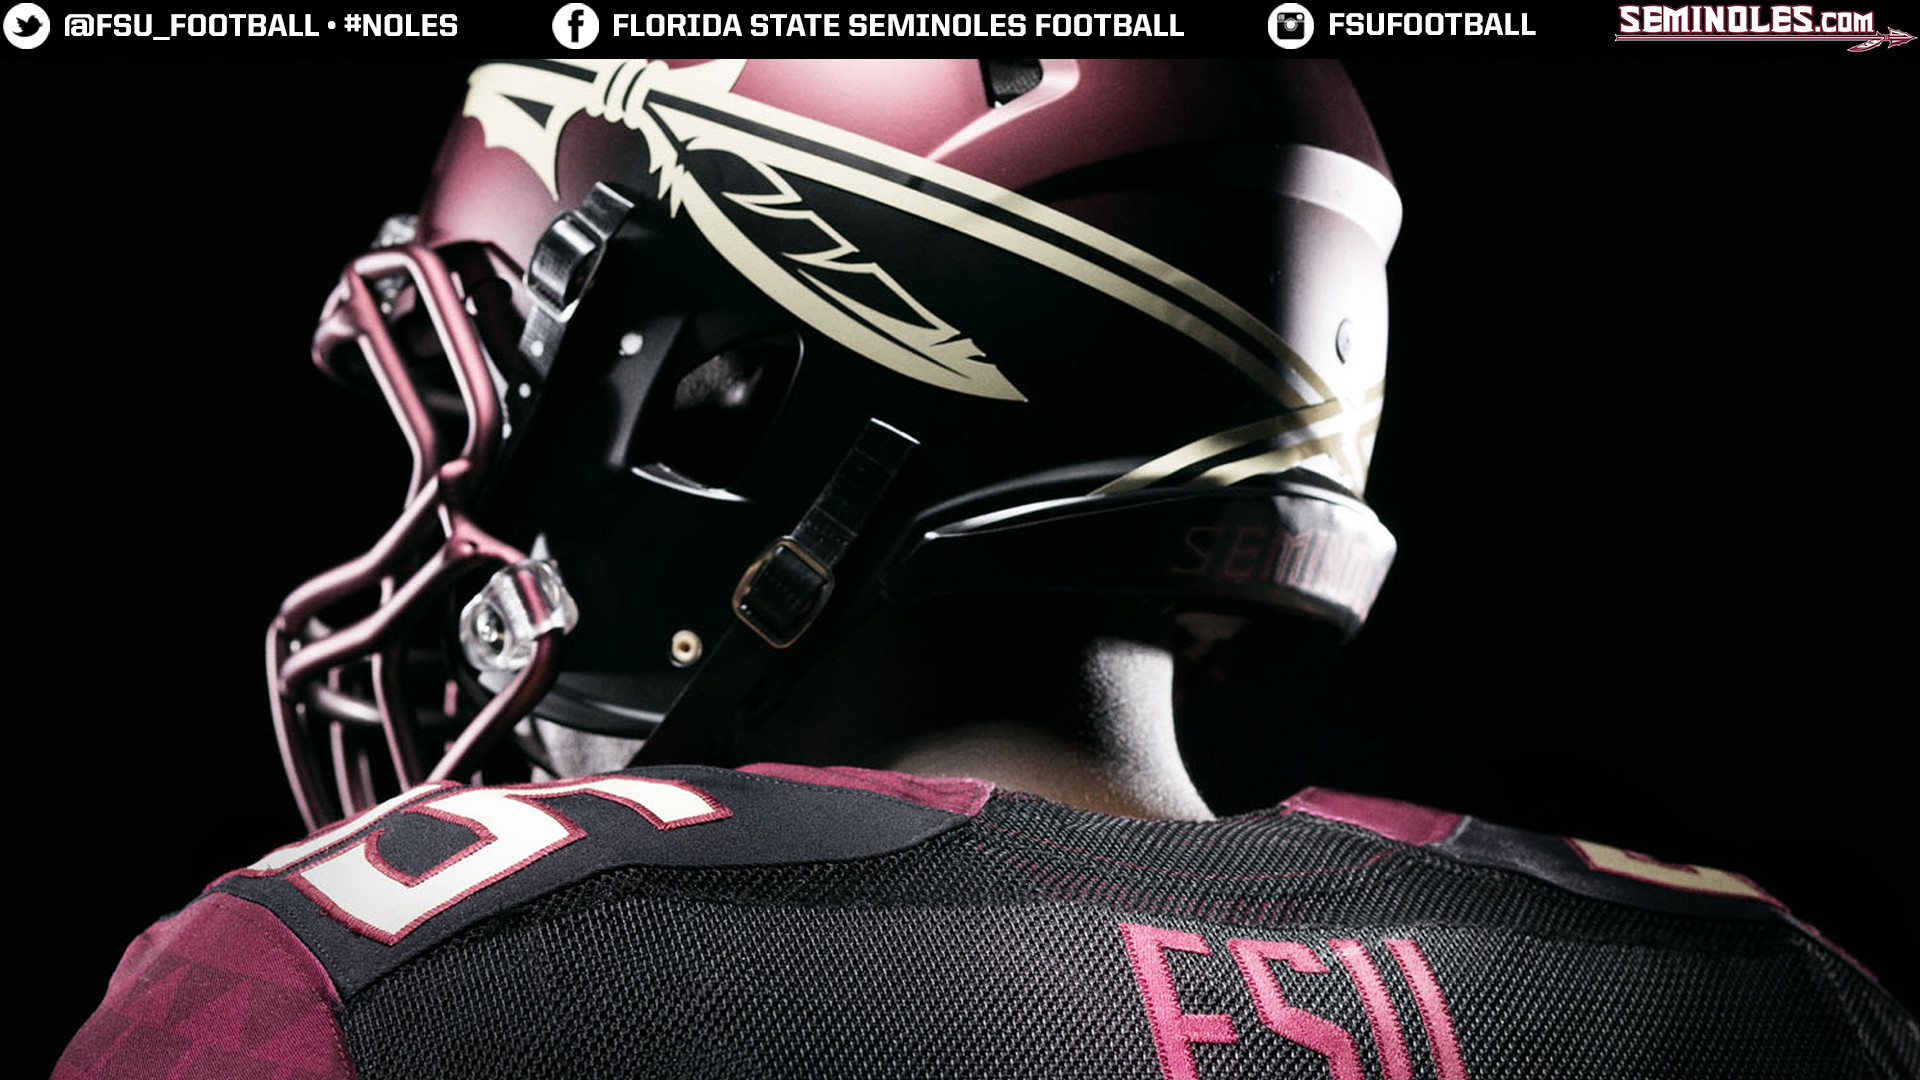 COM DESKTOP WALLPAPERS – Florida State Seminoles Official .